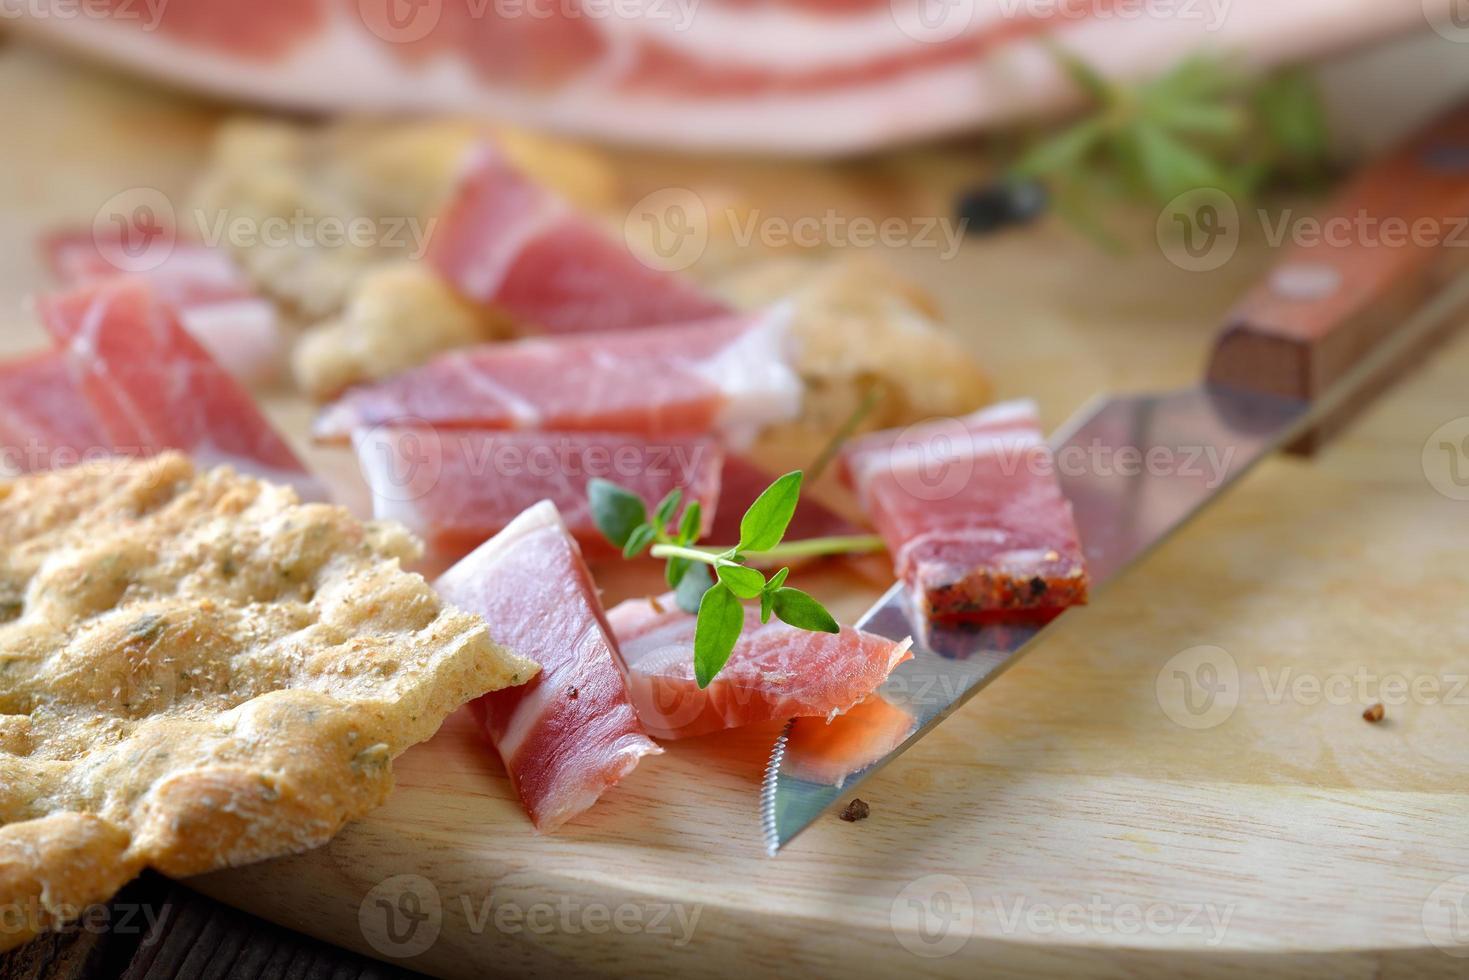 södra tyrolska bacon foto